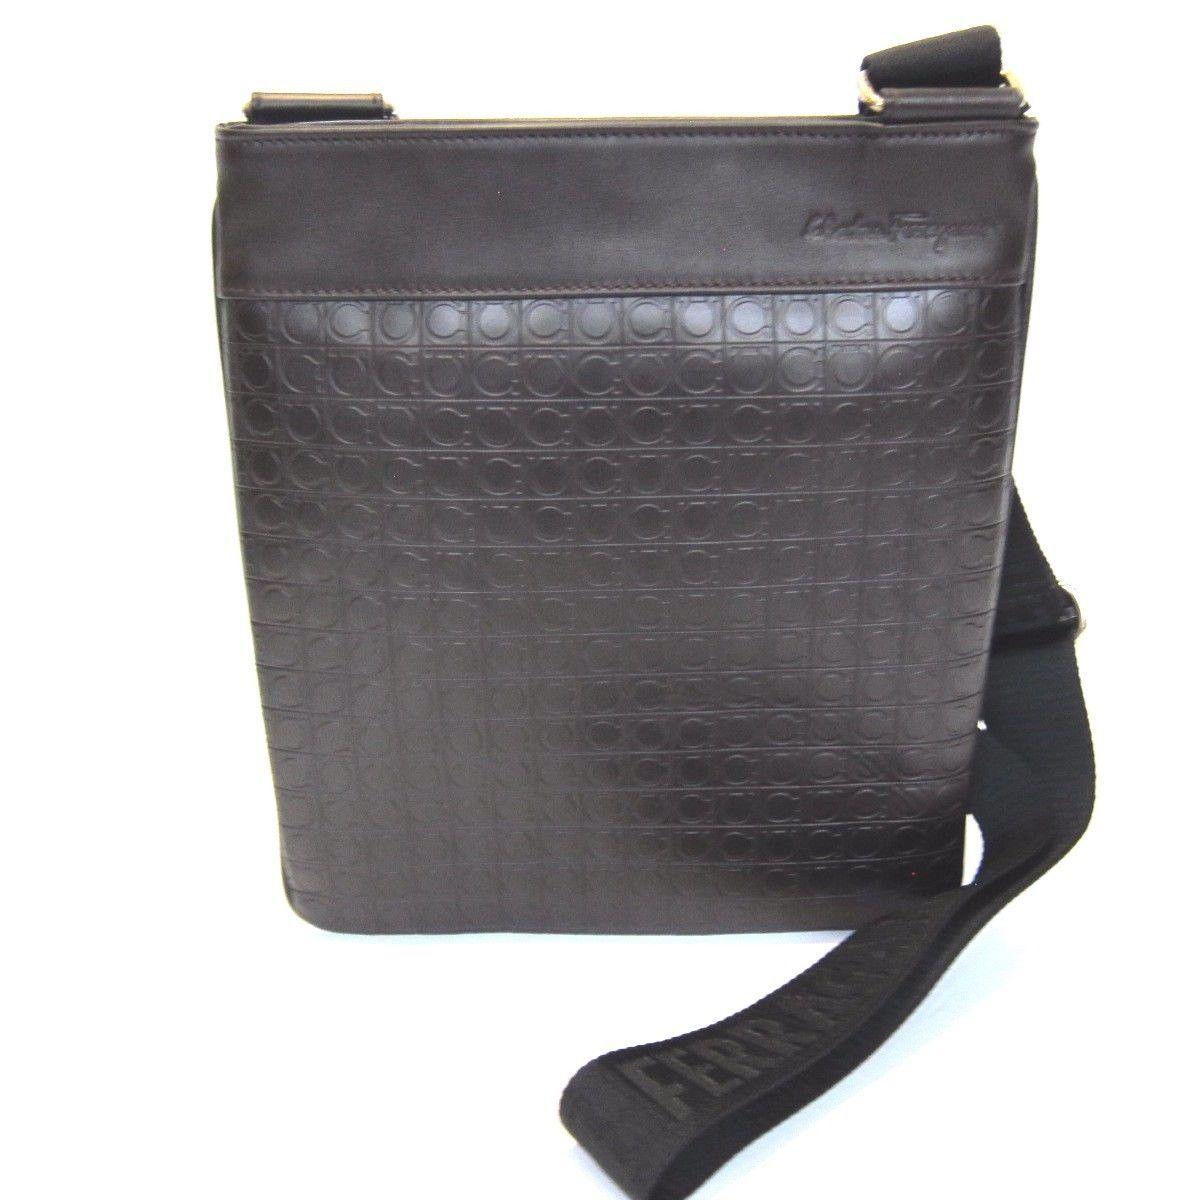 S l1600. S l1600. Previous. B-288223 New Salvatore Ferragamo Brown Logo  Leather Messenger Shoulder Bag f4e2e09c9795c